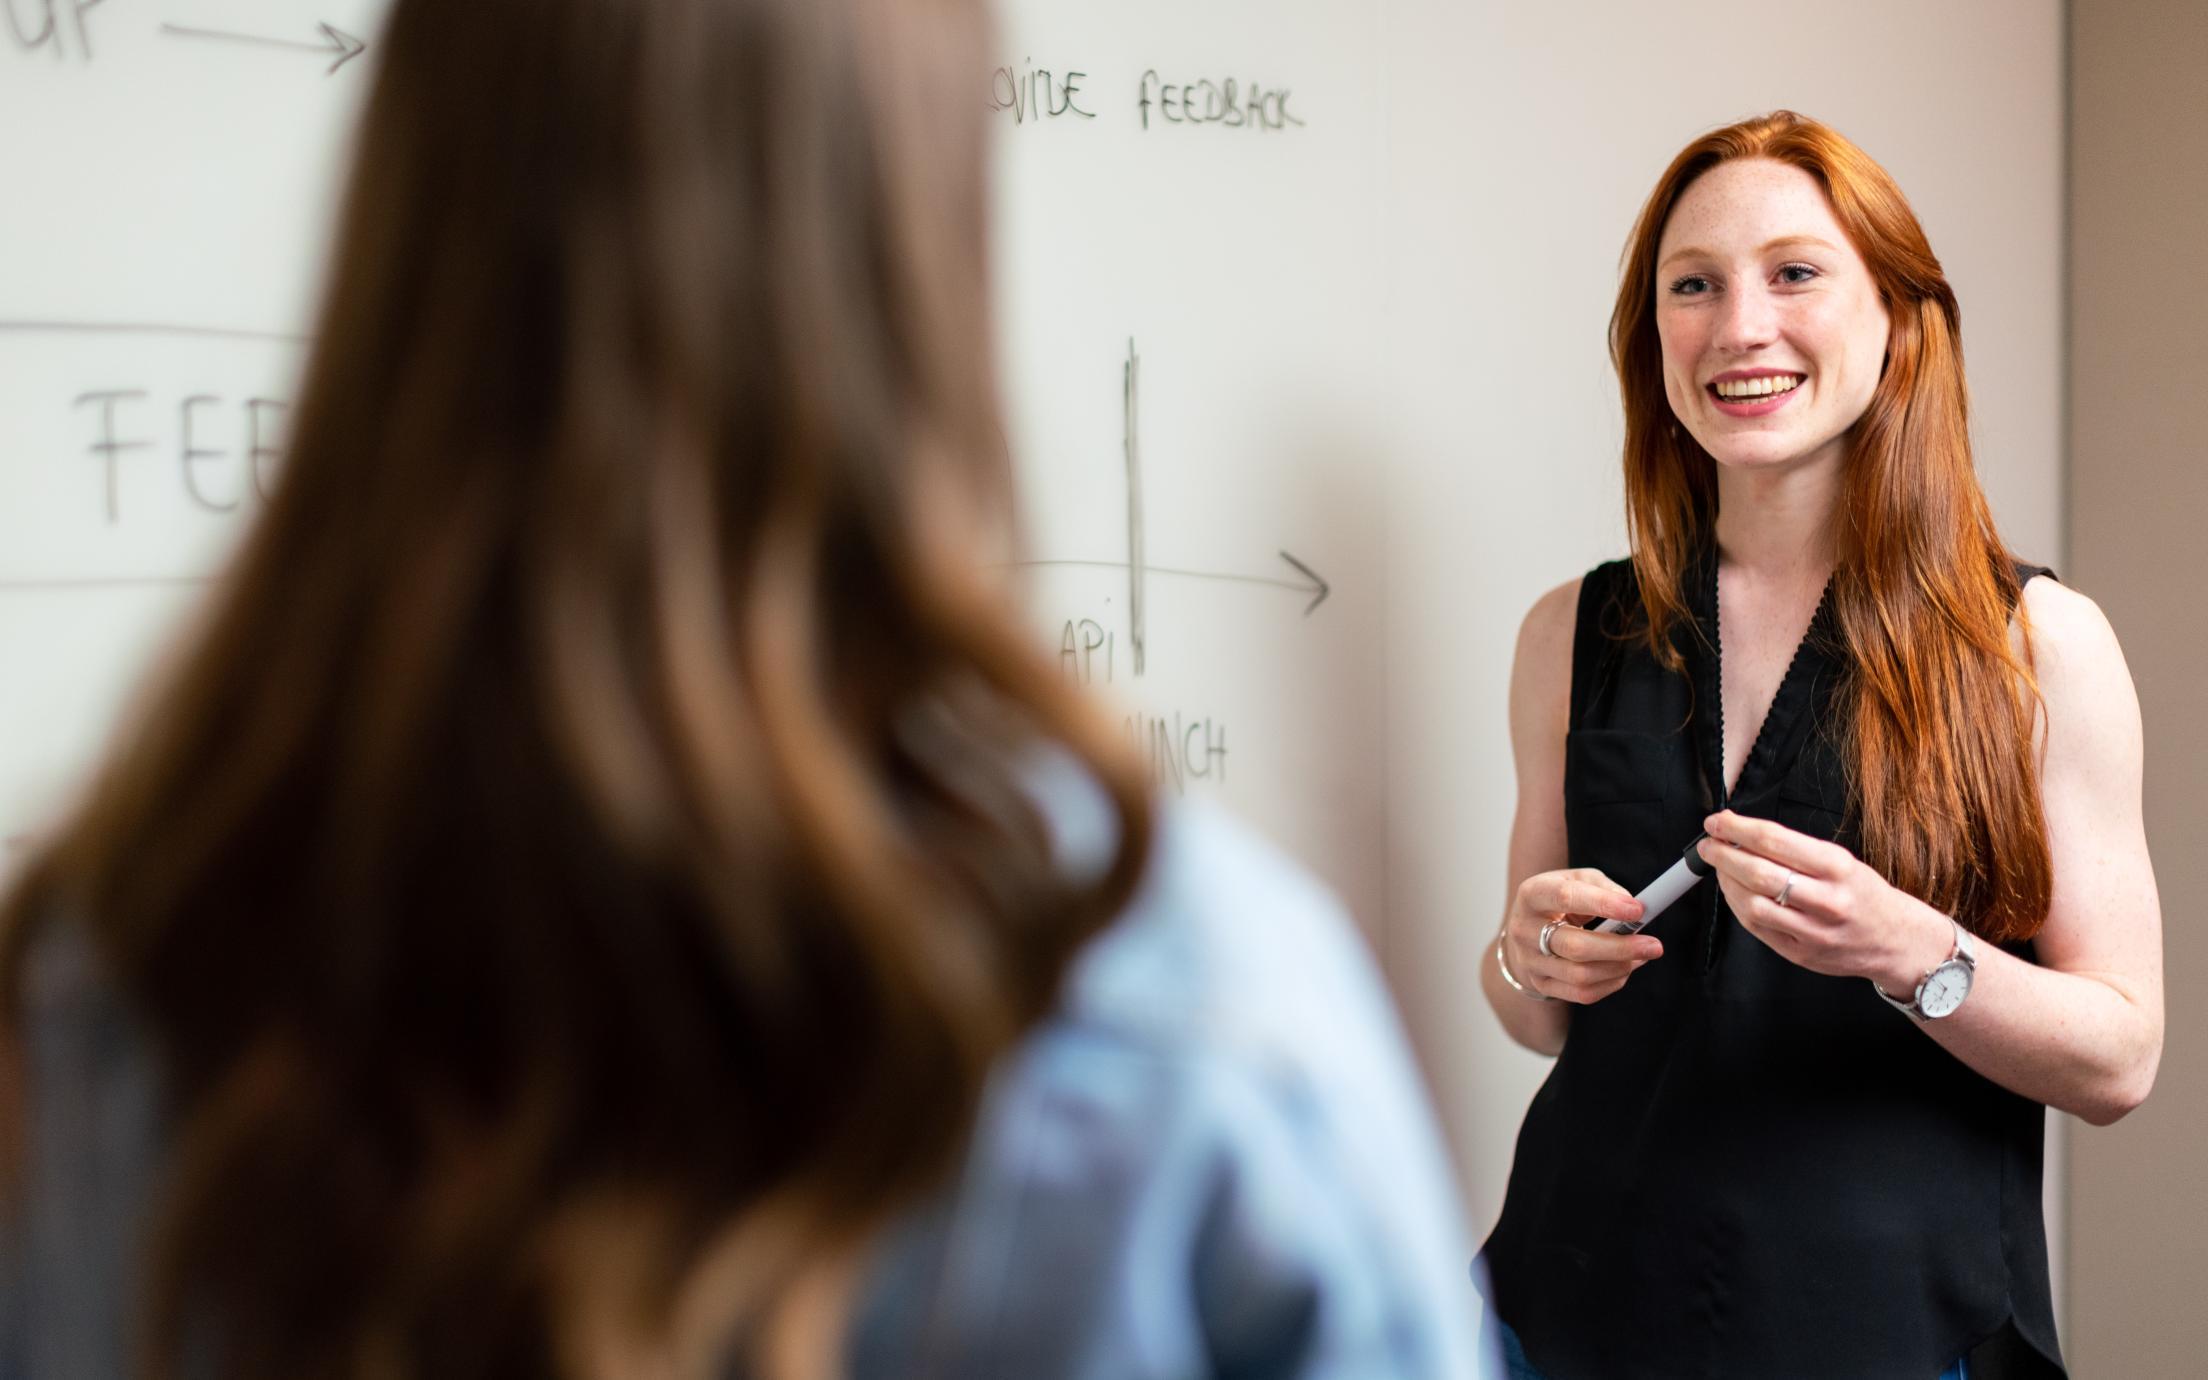 Student Teacher on Practicum